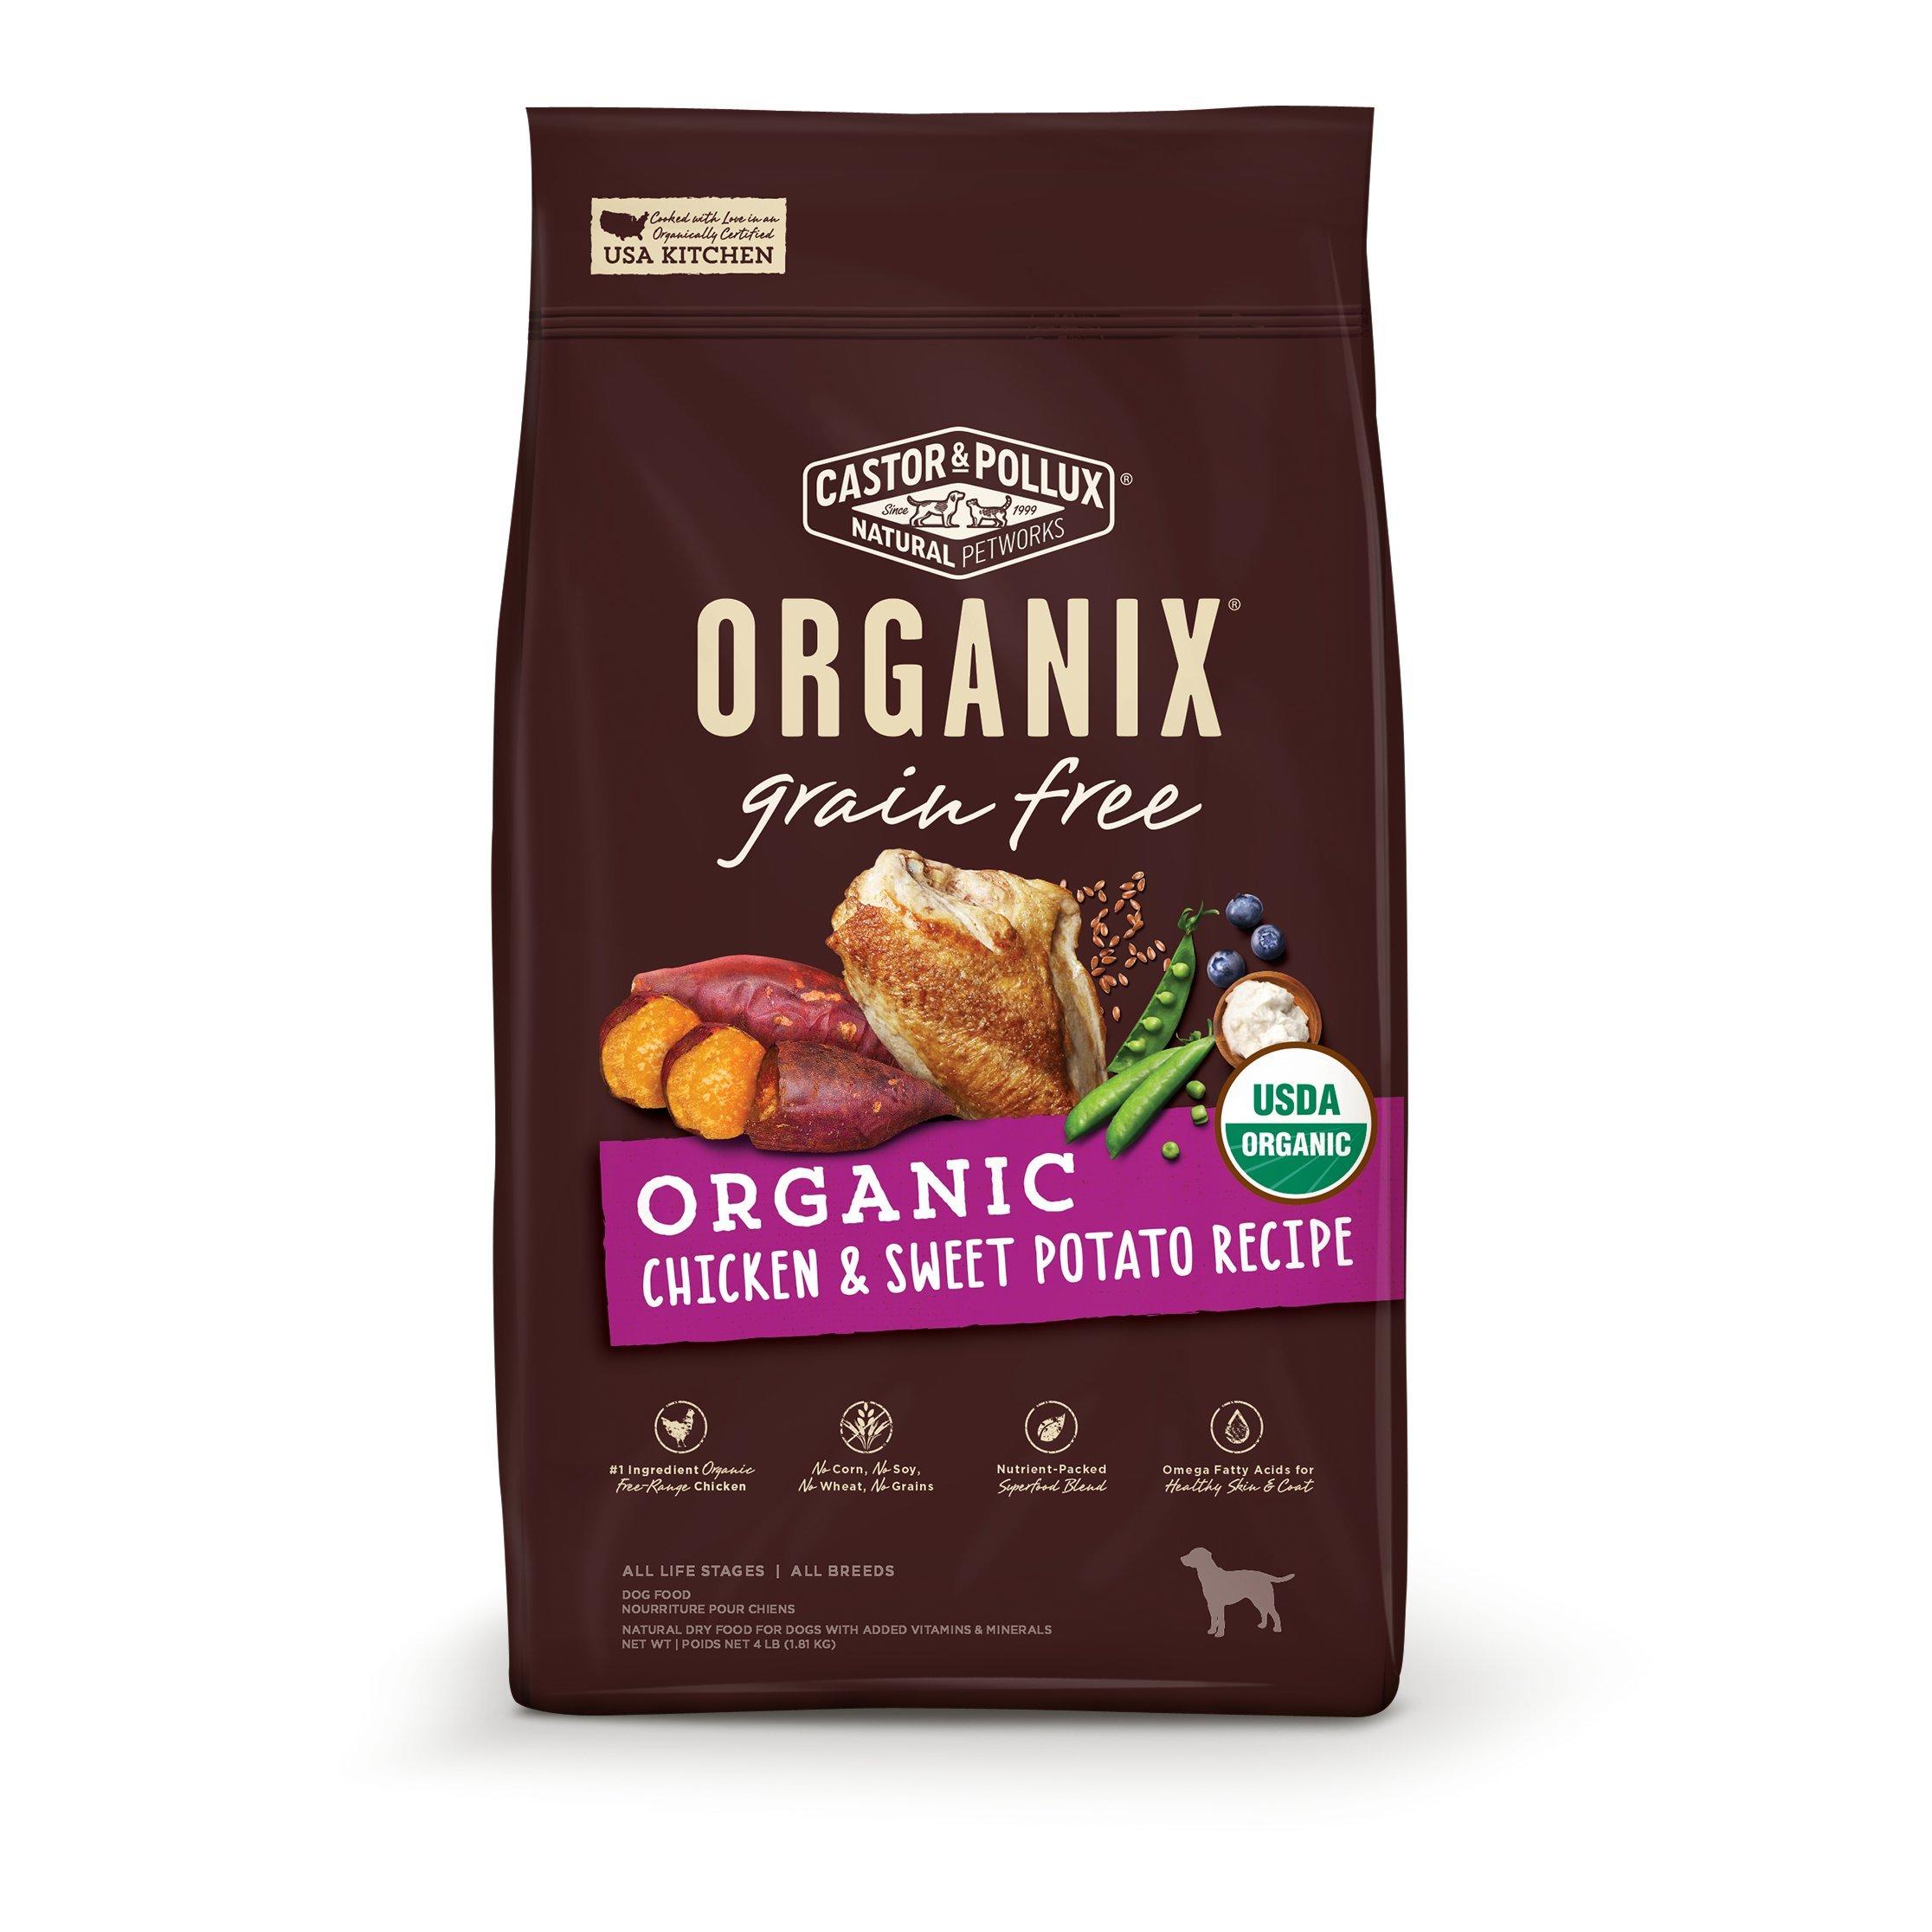 Castor & Pollux Organix Grain Free Organic Chicken & Sweet Potato Recipe Dry Dog Food 18Lbs by Castor & Pollux (Image #1)